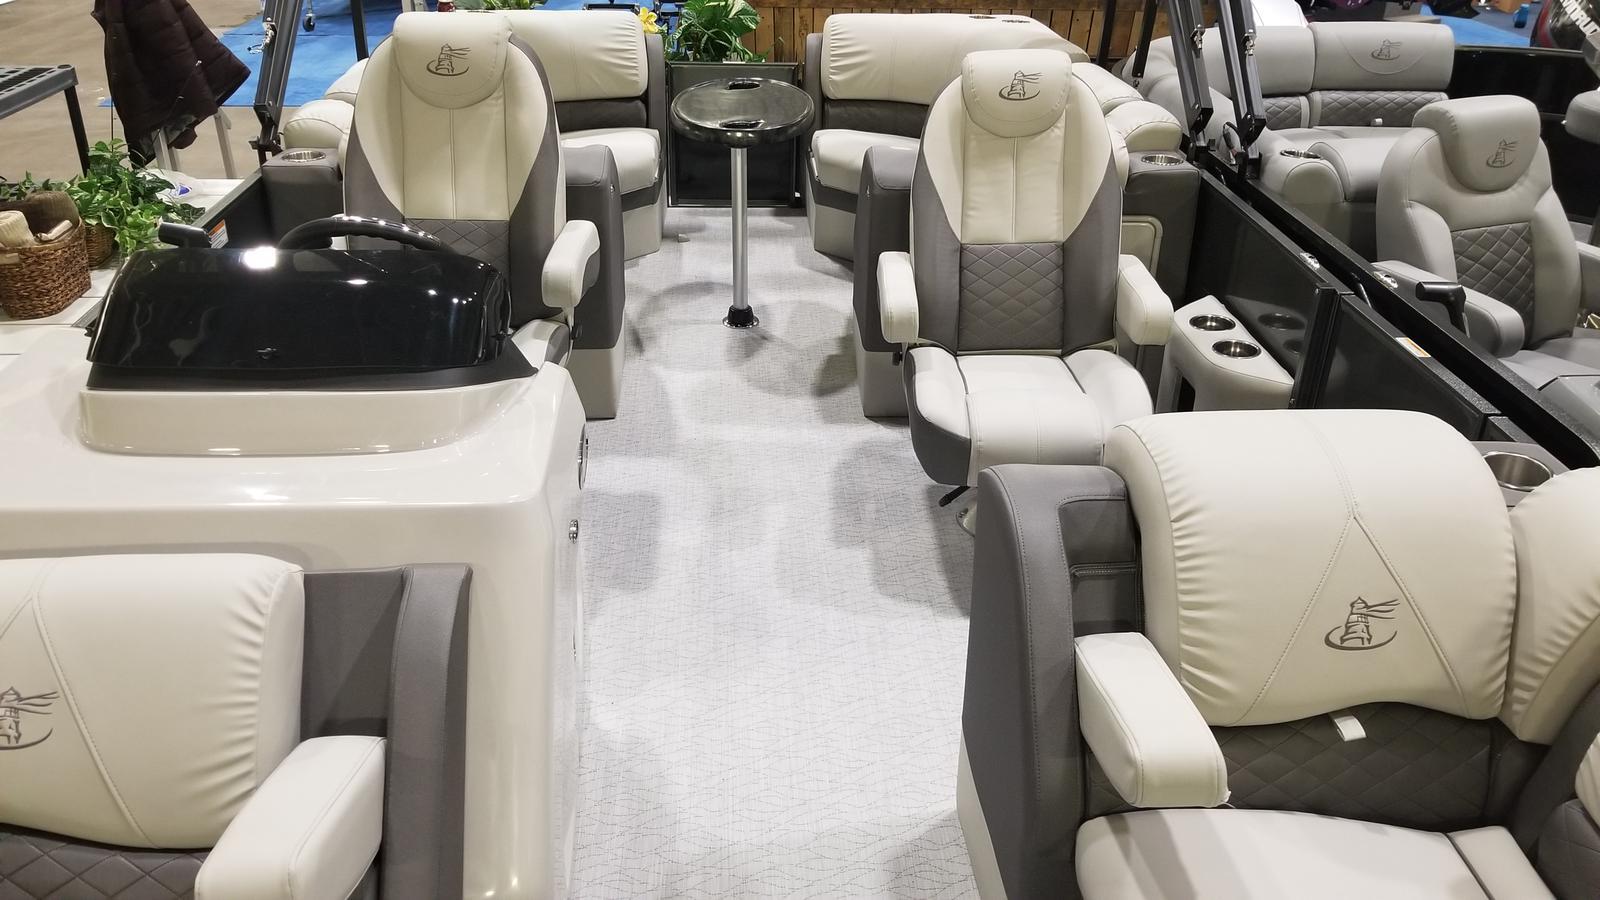 2018 Misty Harbor Skye 2385SU Sportoon With A 140 HP Suzuki Motor ( Any  Suzuki Motor Up To 150 HP Available )